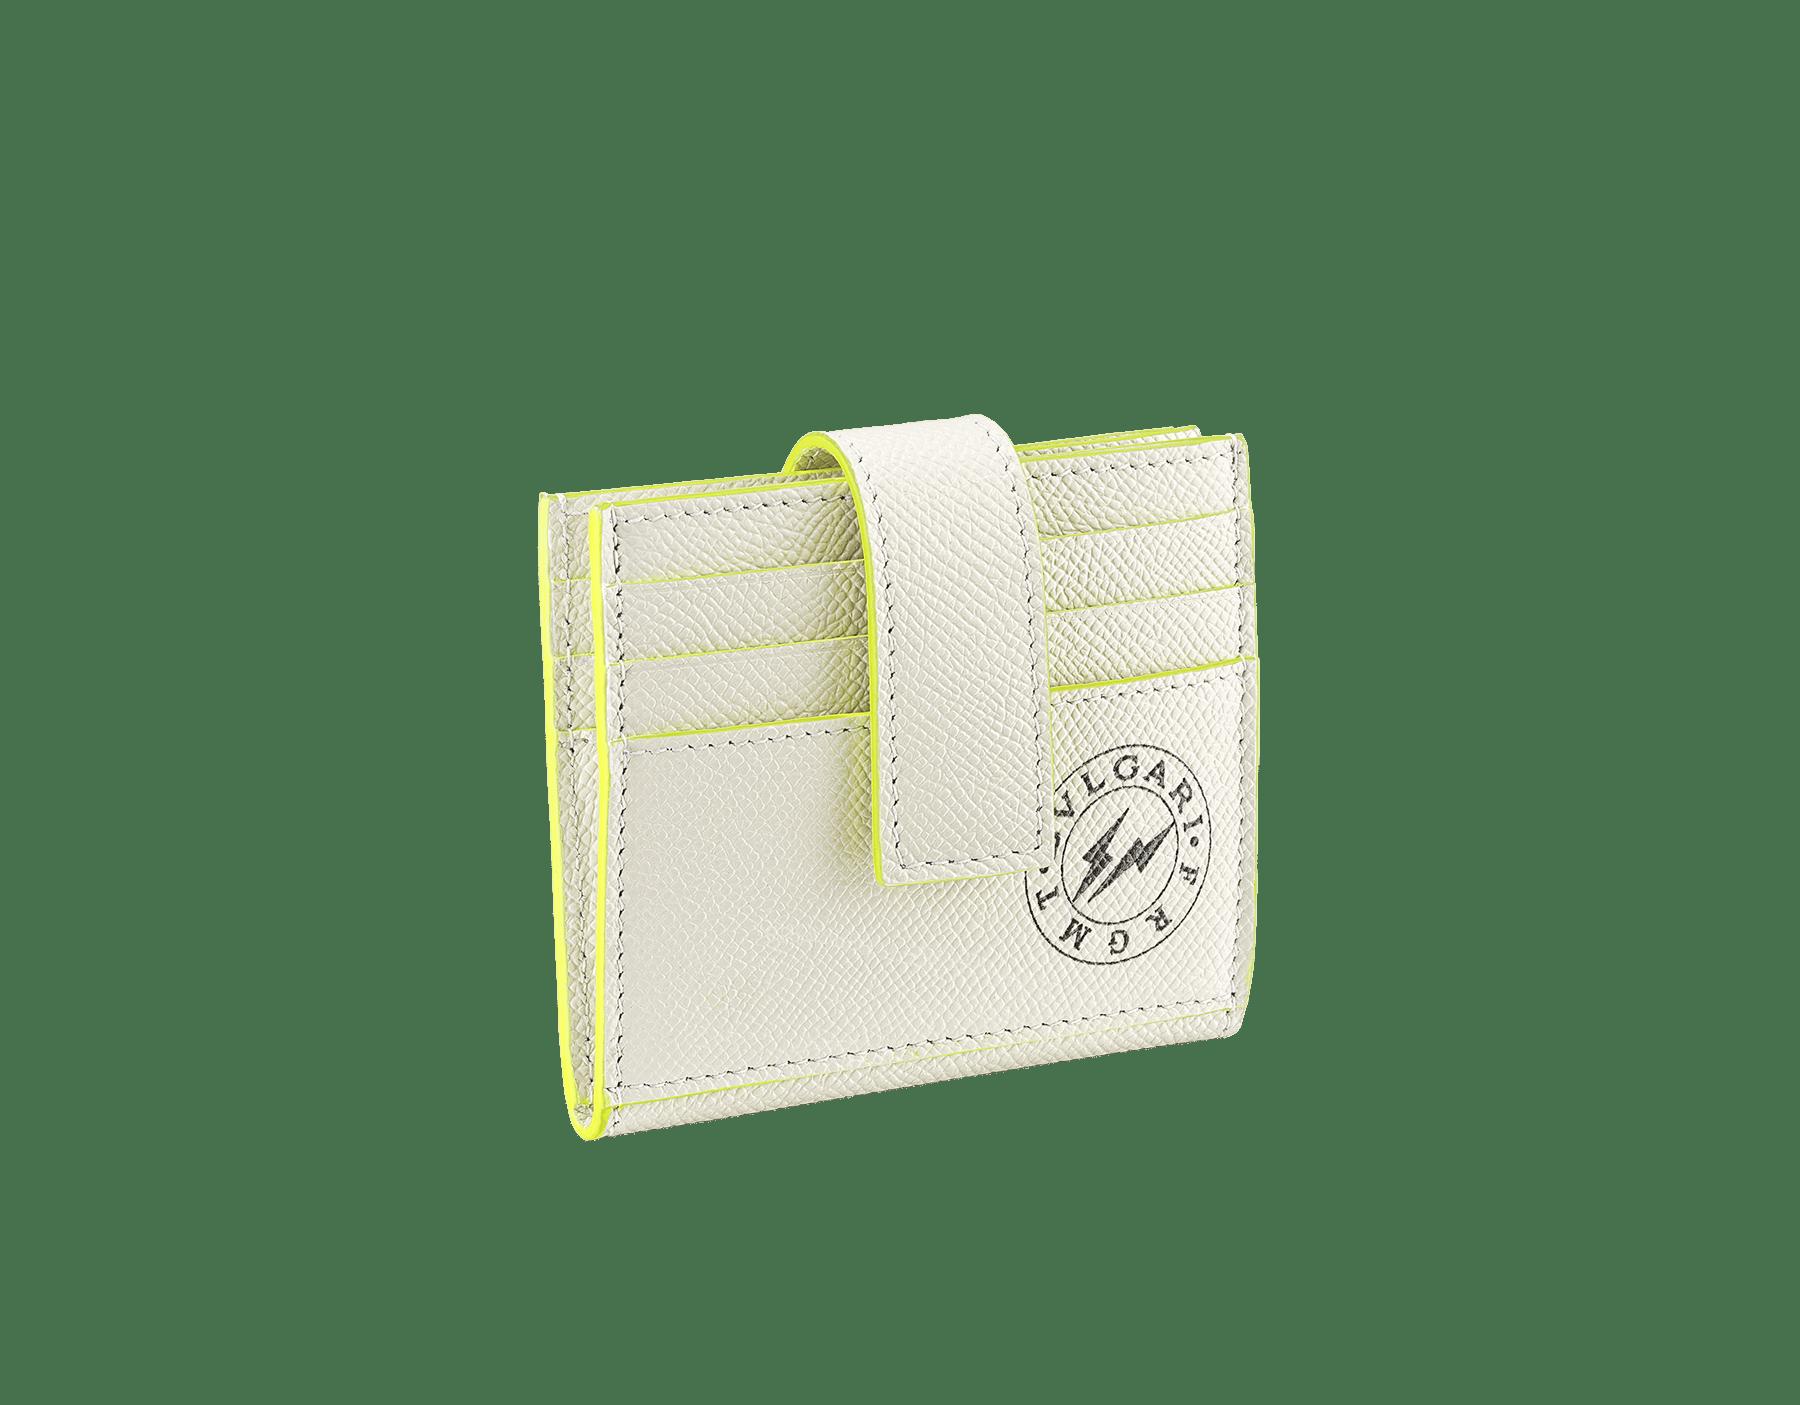 BVLGARI x FRAGMENT by Hiroshi Fujiwara ビジネスカードホルダー。ホワイトと蛍光イエローのグレインカーフレザー製。特別なBVLGARI FRGMTのブラックロゴプリント。 289527 image 1